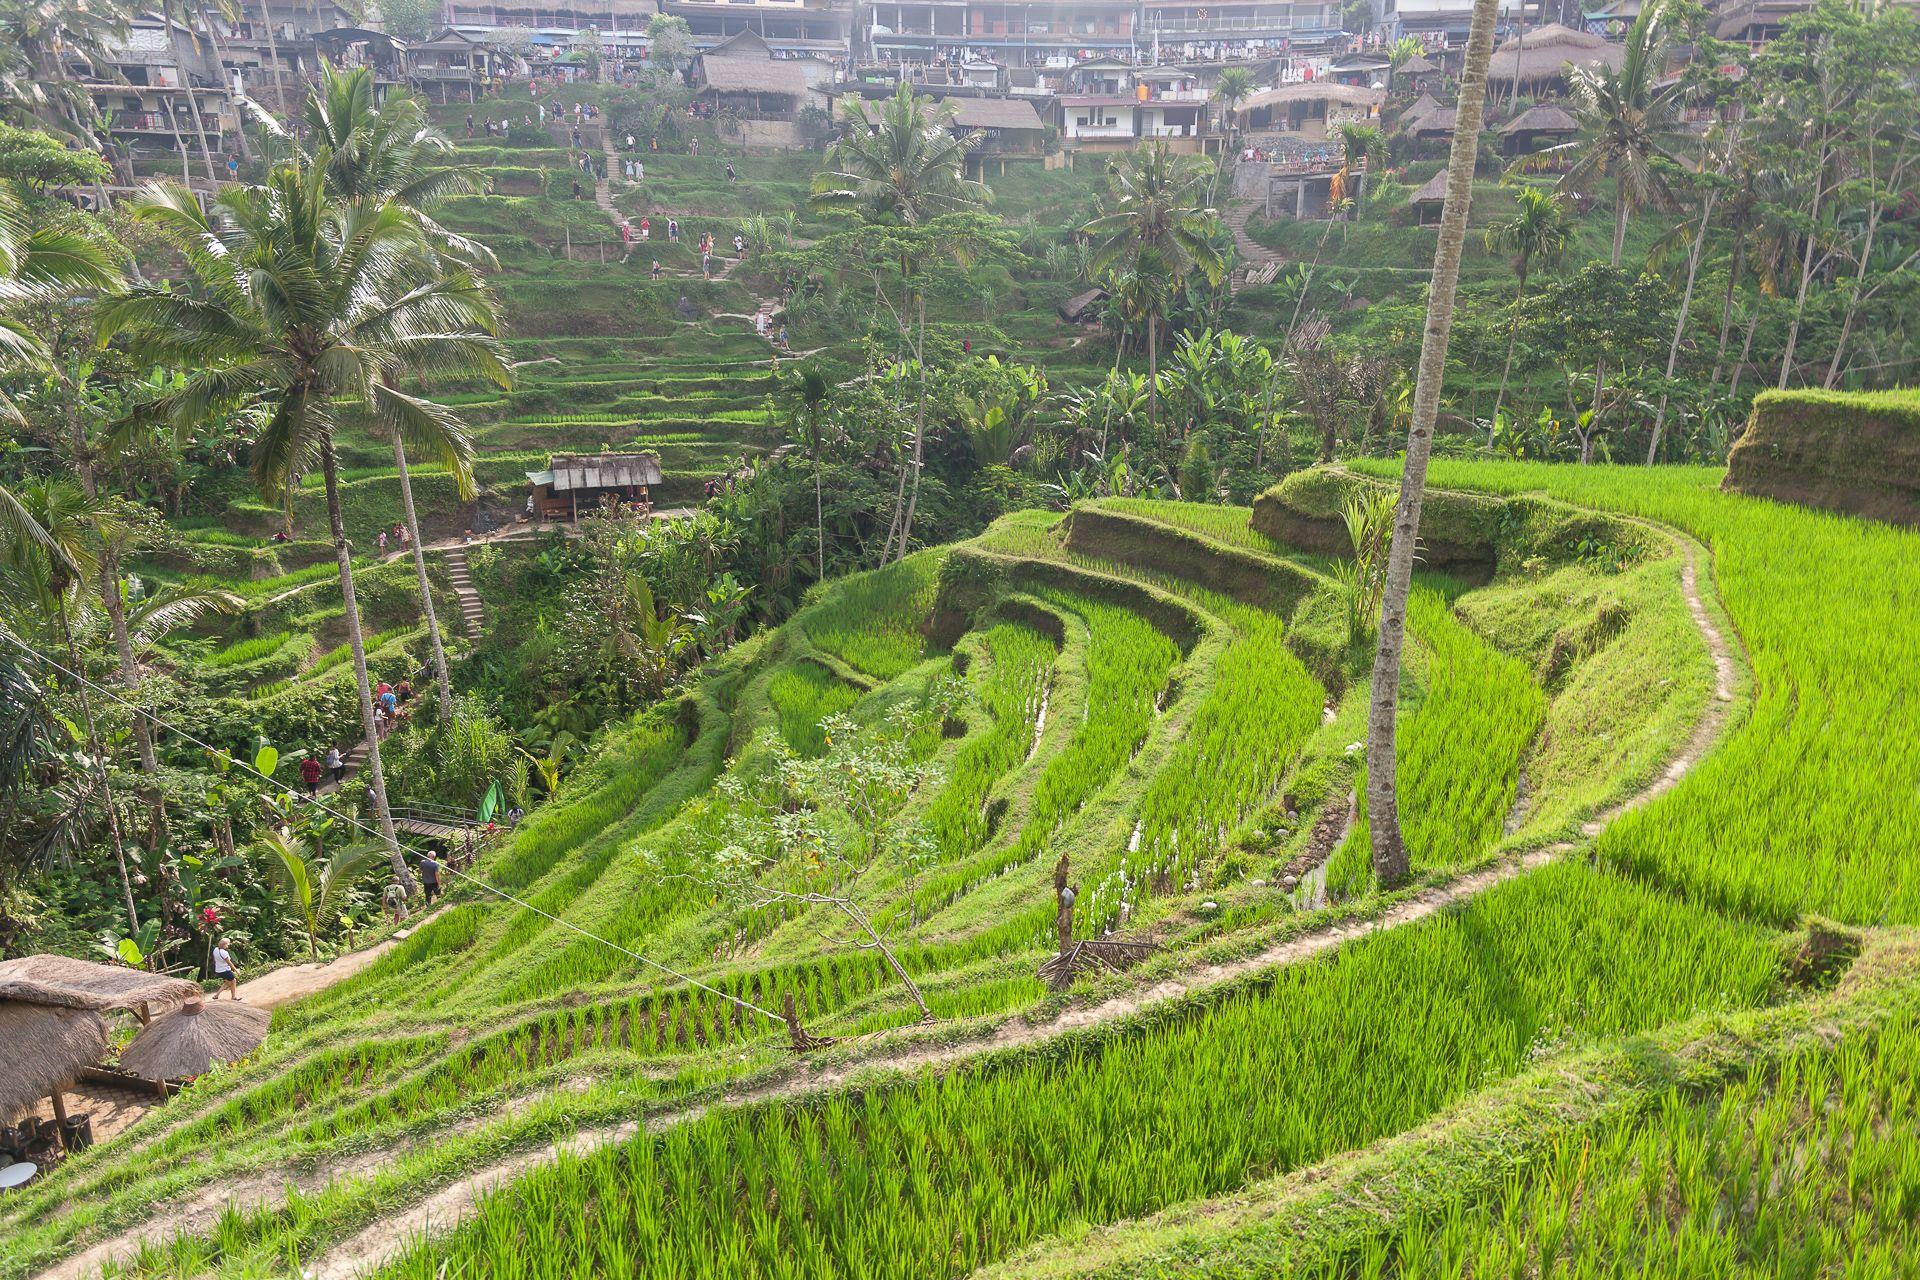 Бали, Bali, Indonesia, Индонезия, rise terraces, rise terraces Bali, Тегаллаланг, Tegallalang, достопримечательности Бали, что посмотреть на Бали, Убуд что посмотреть, природа на Бали, как выращивают рис на Бали, место для фотосессий на Бали, инстаграм фото Бали, качели в джунглях Бали, качели на Бали, качели на пальмах Бали, сувениры с Бали, развлечения на Бали